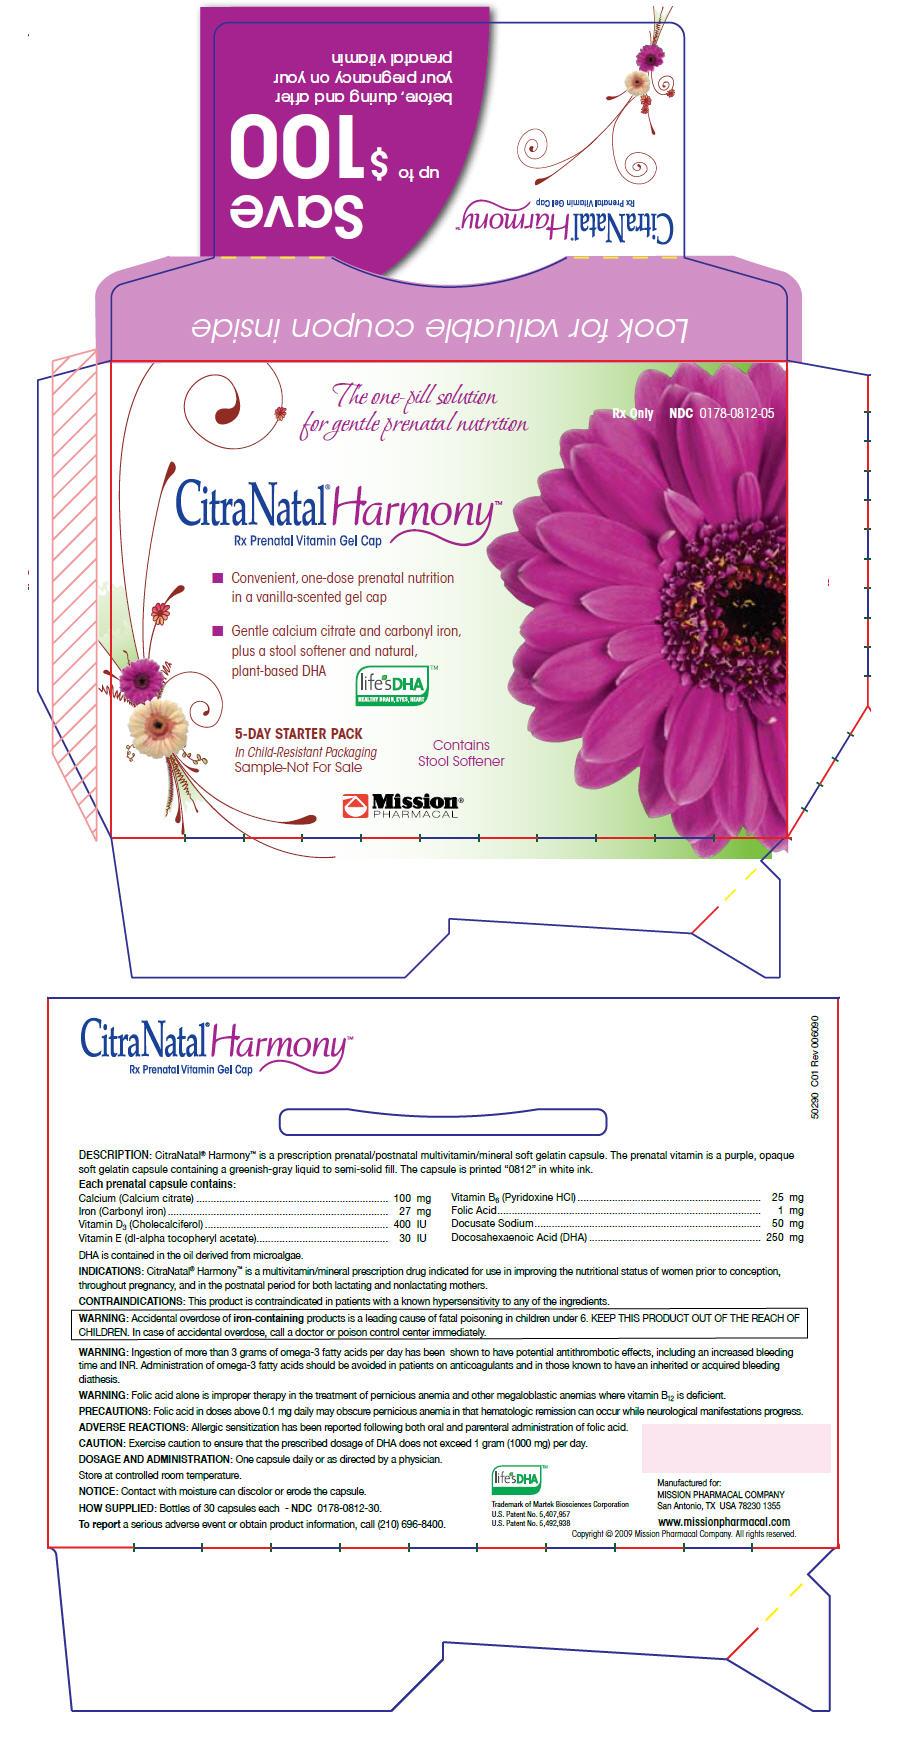 Citranatal Harmony (Calcium Citrate, Iron Pentacarbonyl, Cholecalciferol, Alpha-tocopherol, Dl-, Pyridoxine Hydrochloride, Folic Acid, Docusate Sodium, And Doconexent) Capsule, Gelatin Coated [Mission Pharmacal Company]